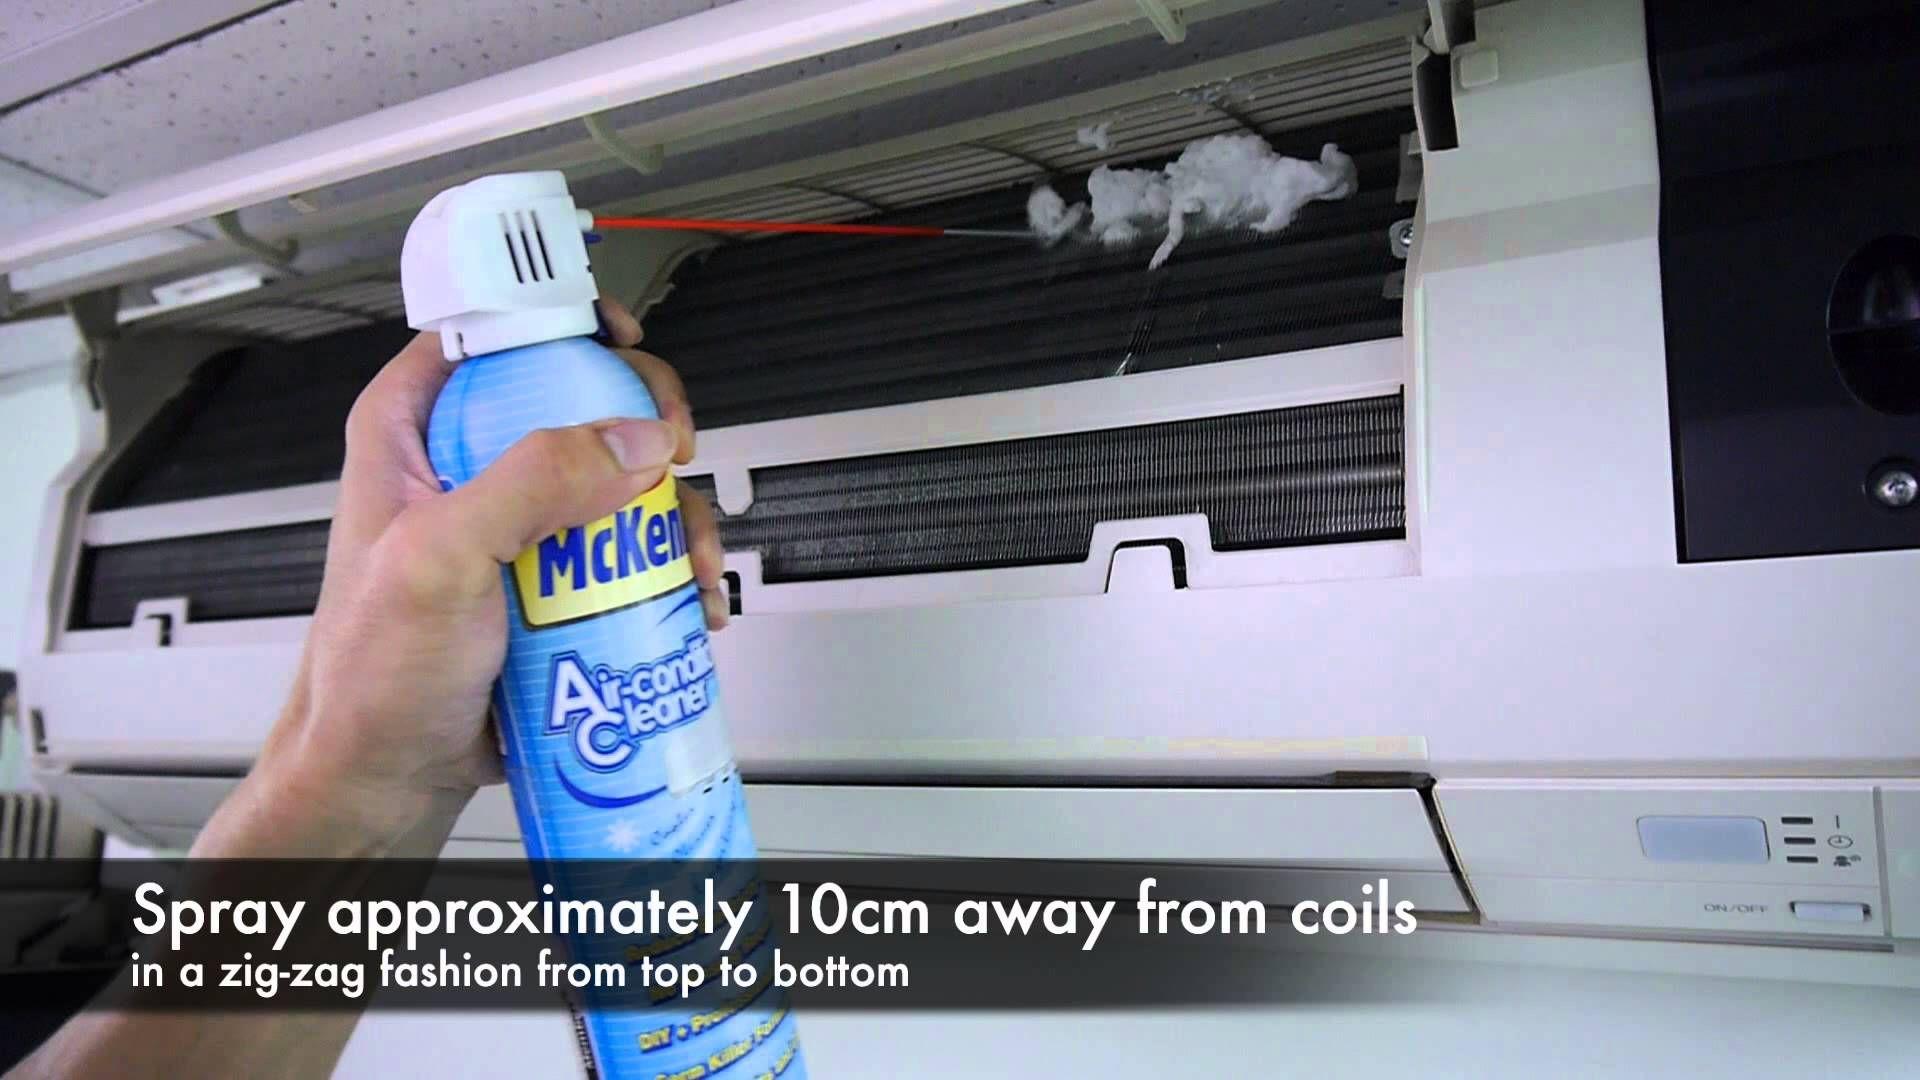 Mr McKenic® AC1926 AirConditioner Cleaner (Self